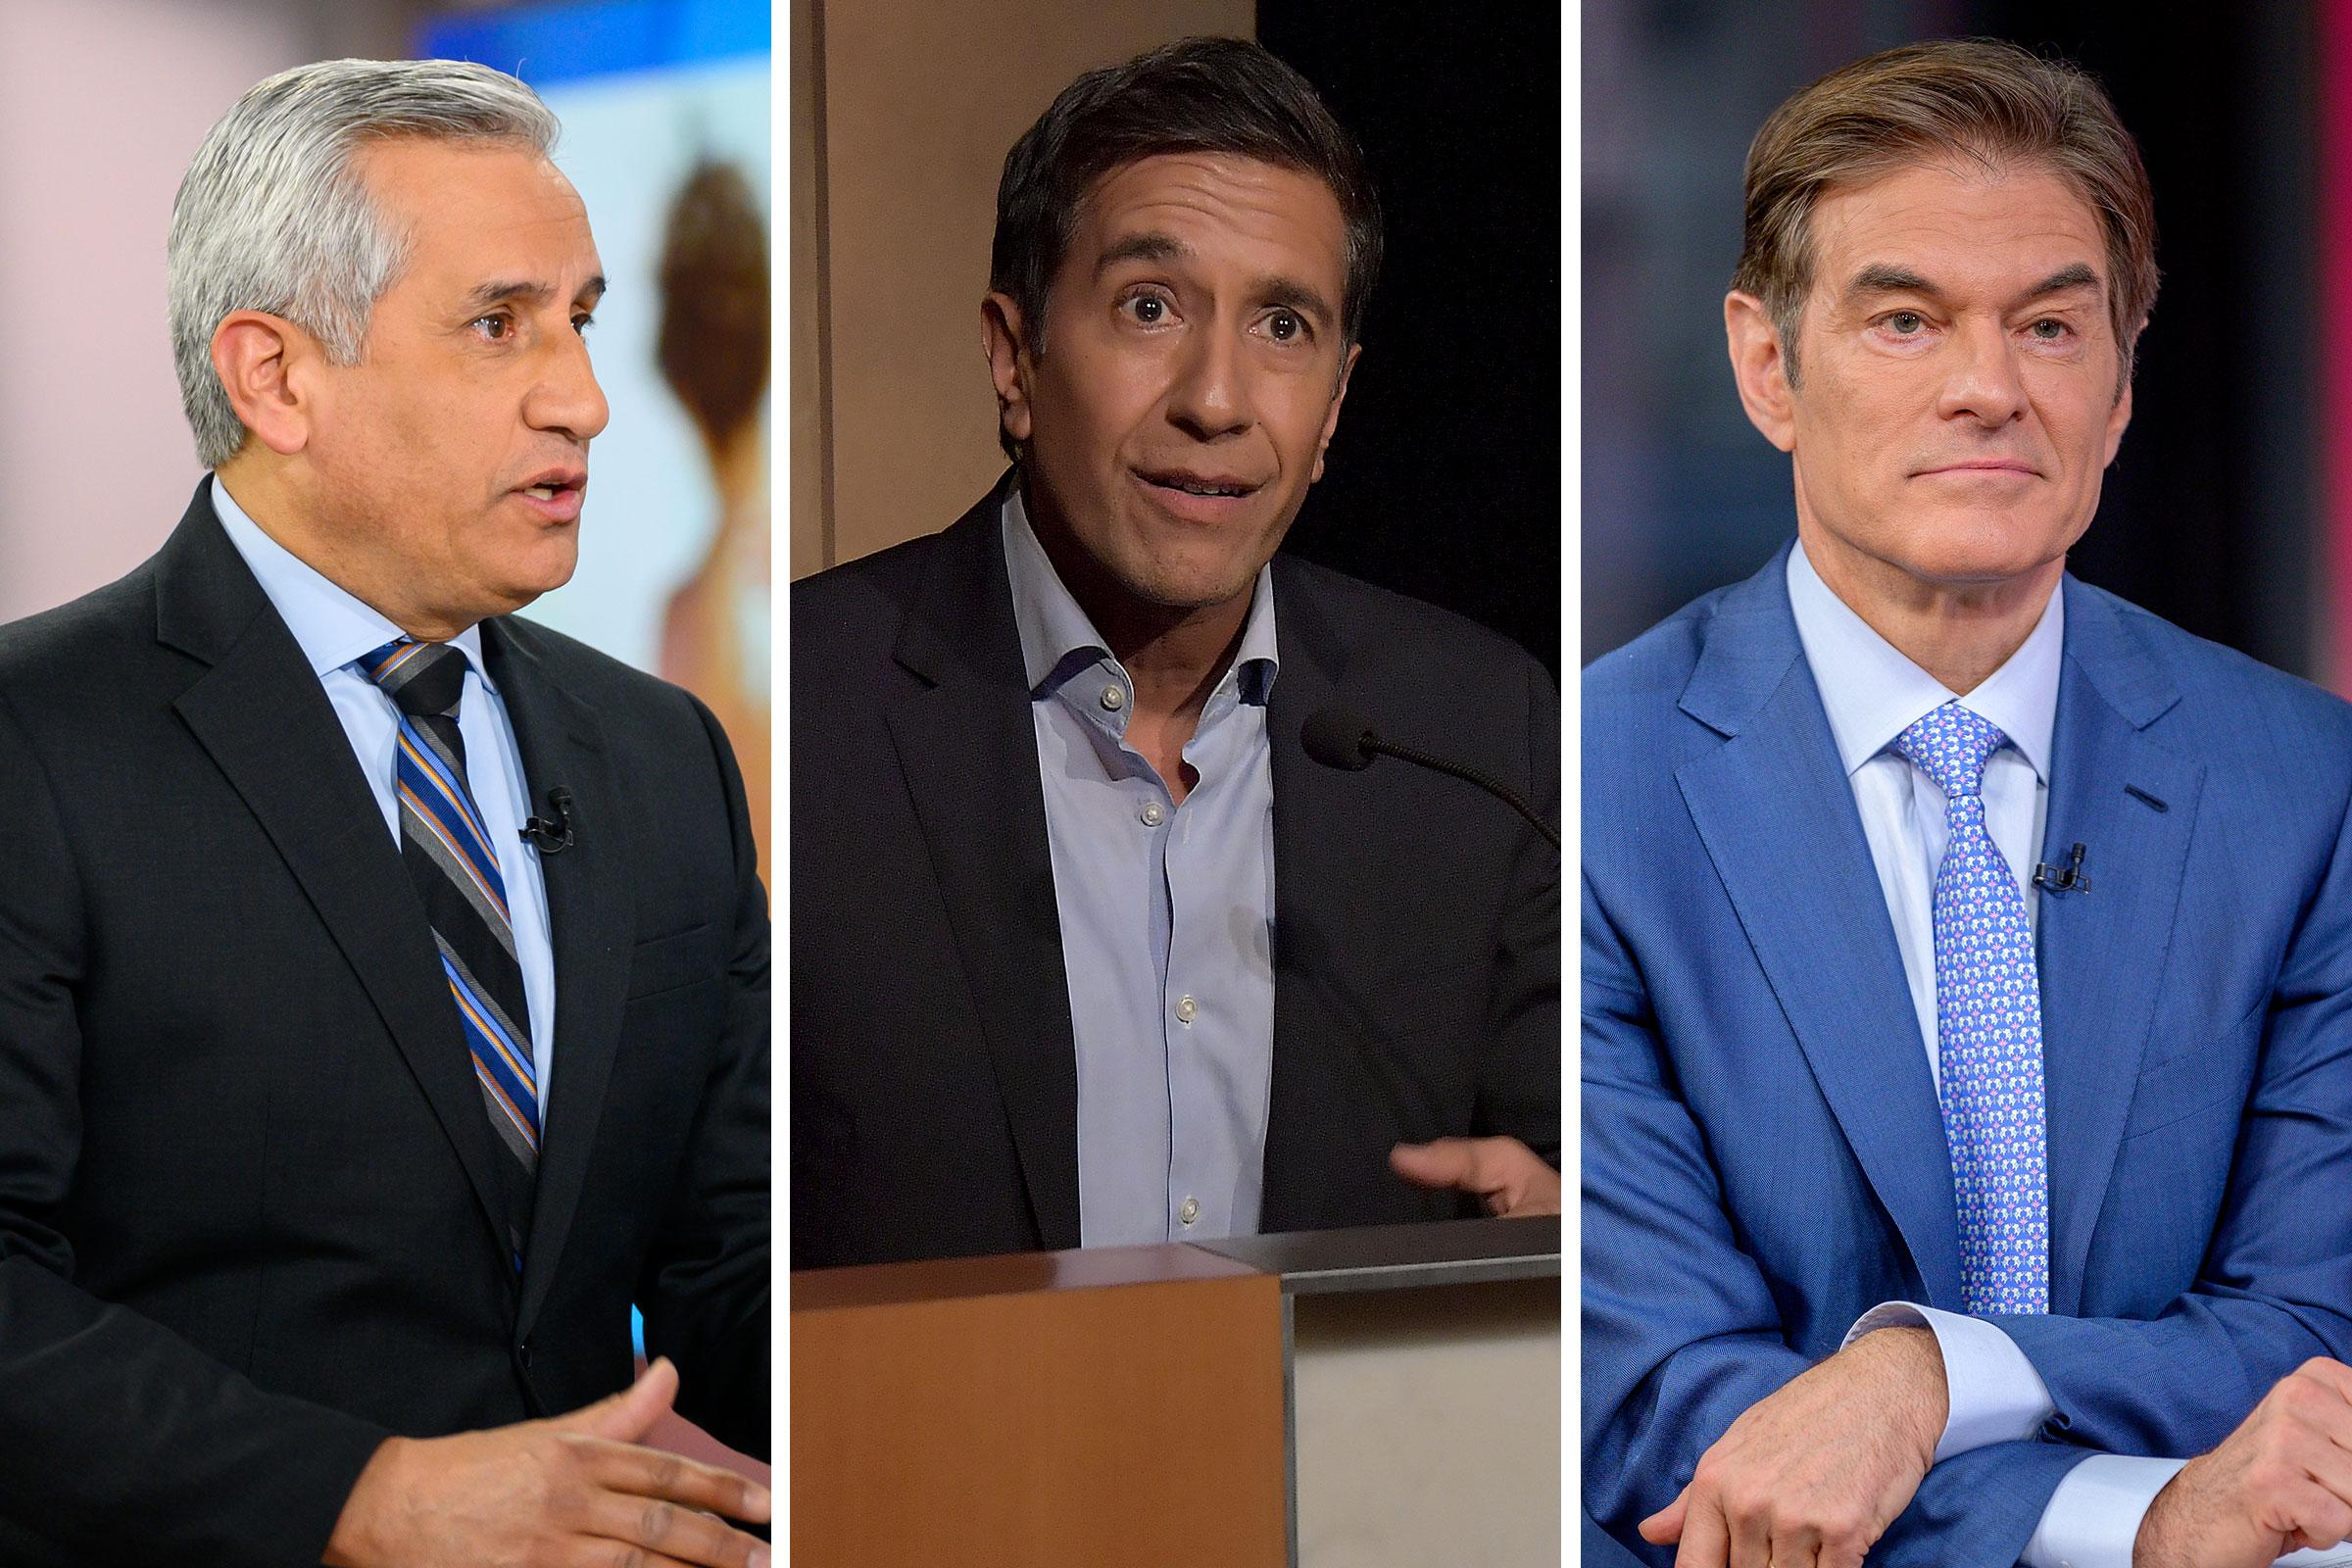 Dr. John Torres; Dr. Sanjay Gupta; Dr. Oz